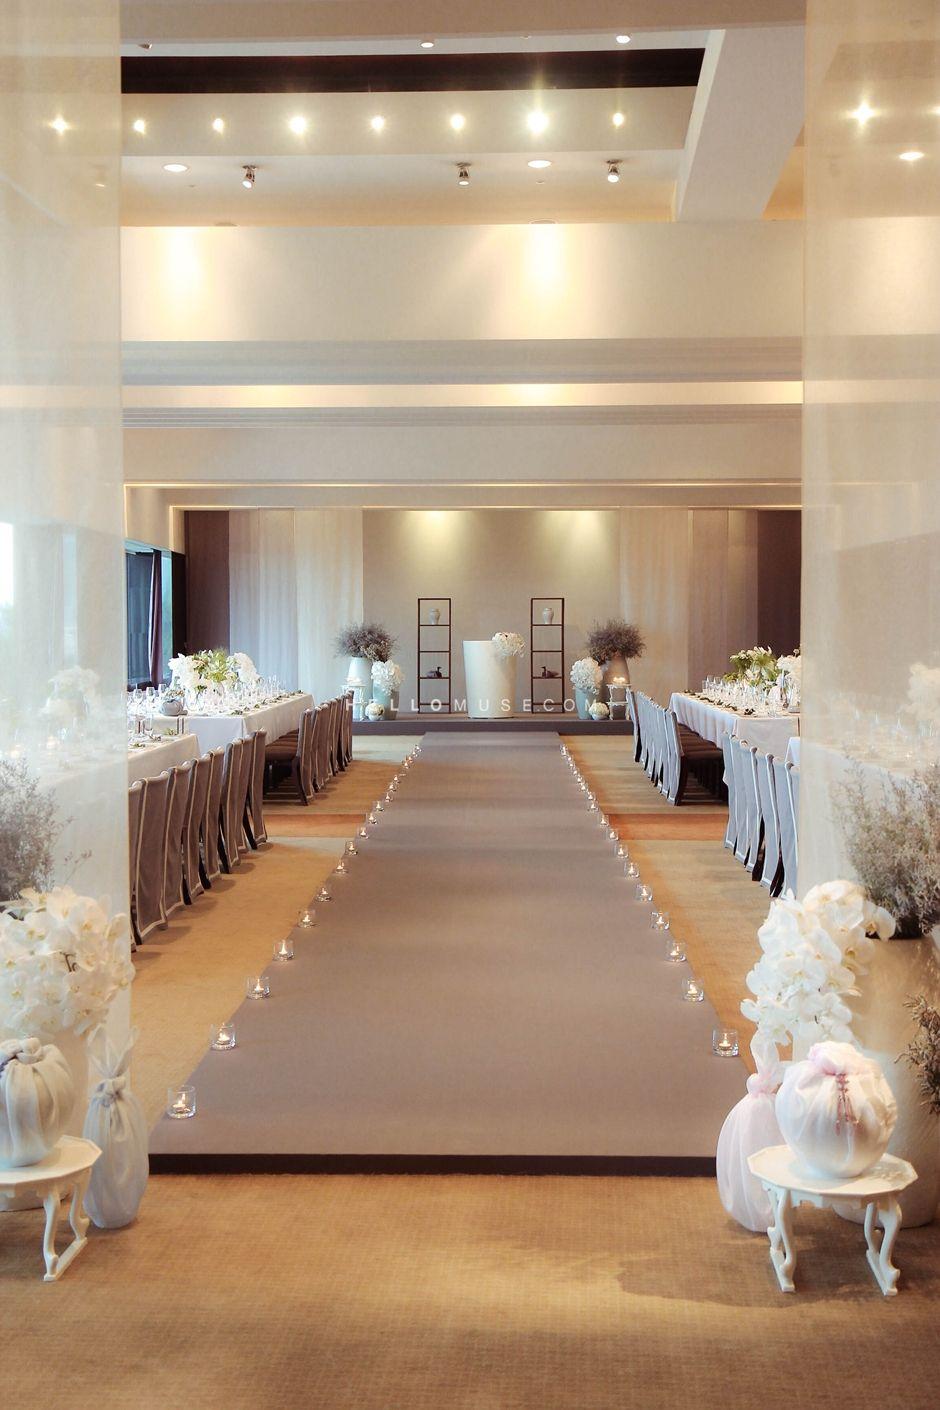 Wedding Banquet In Seoul Korea Grand Hyatt Venue Planner